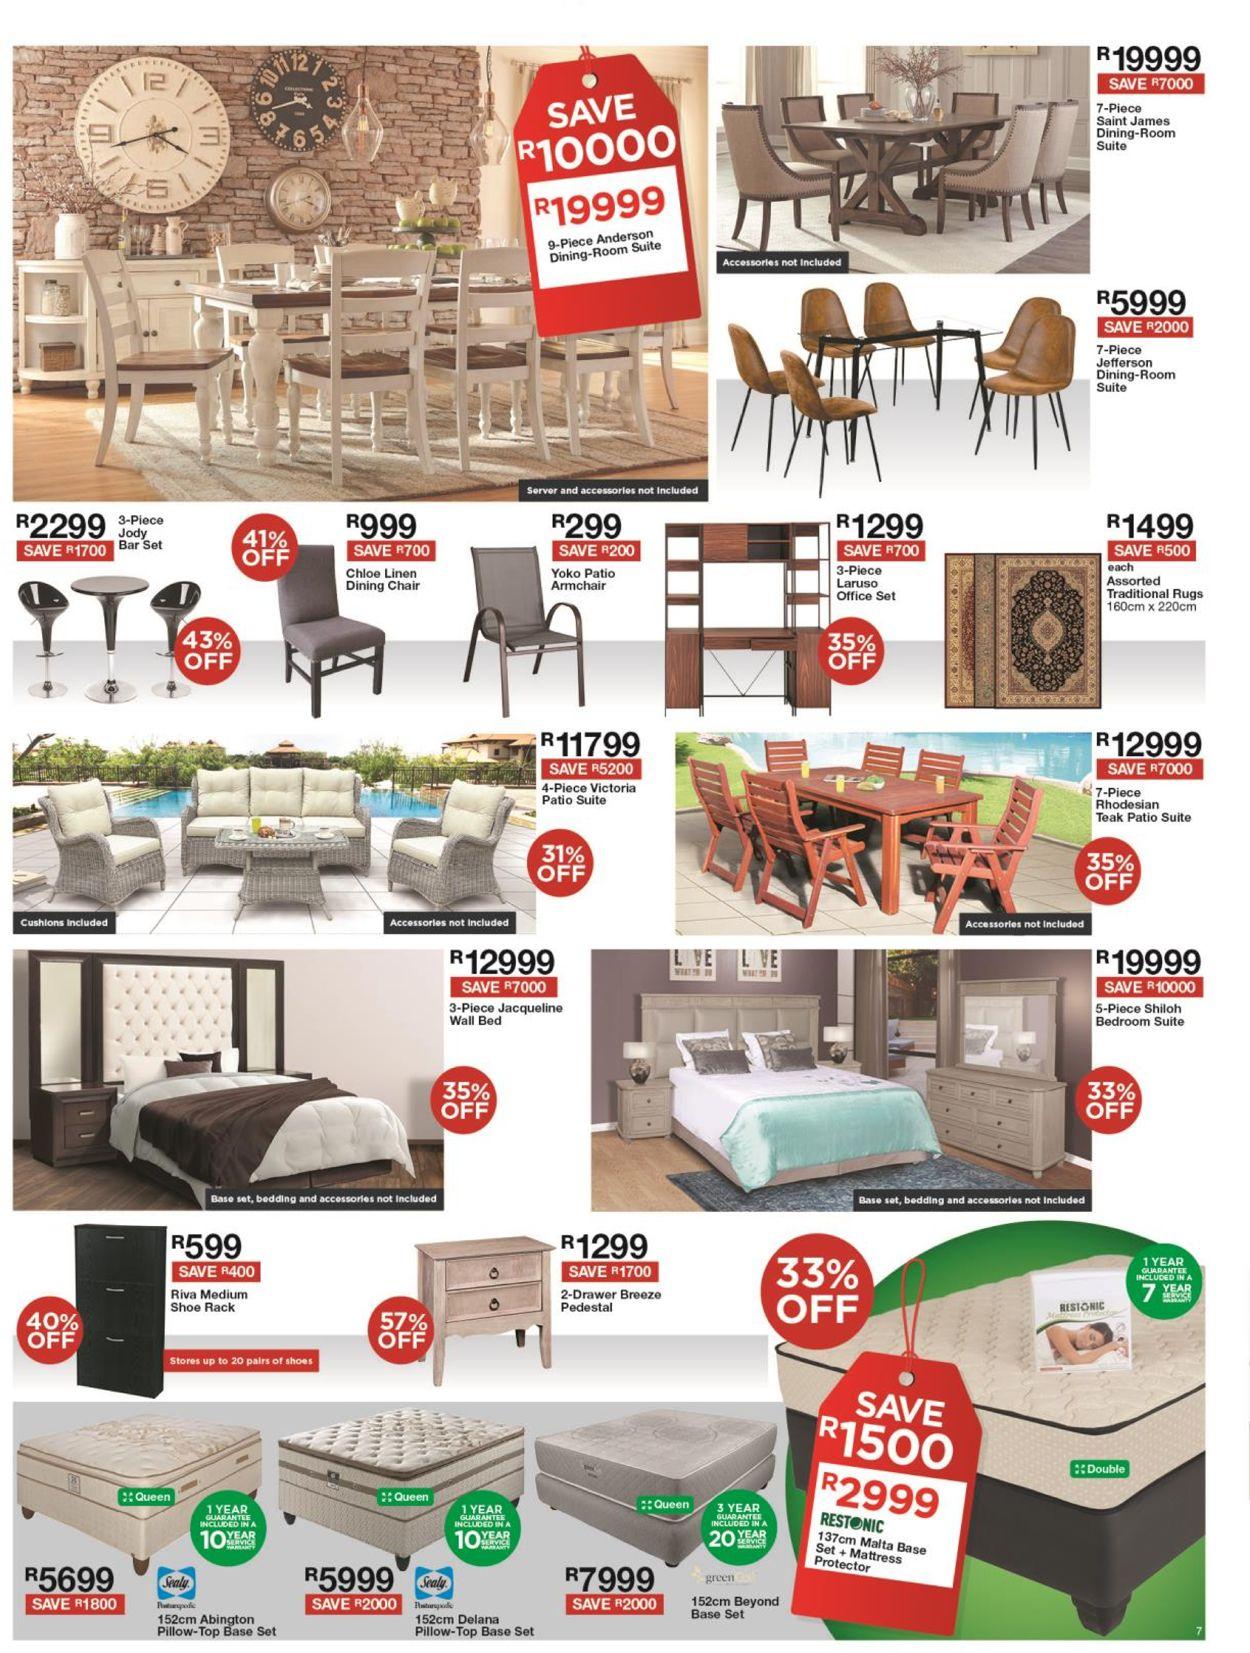 House & Home Catalogue - 2019/06/25-2019/07/07 (Page 7)